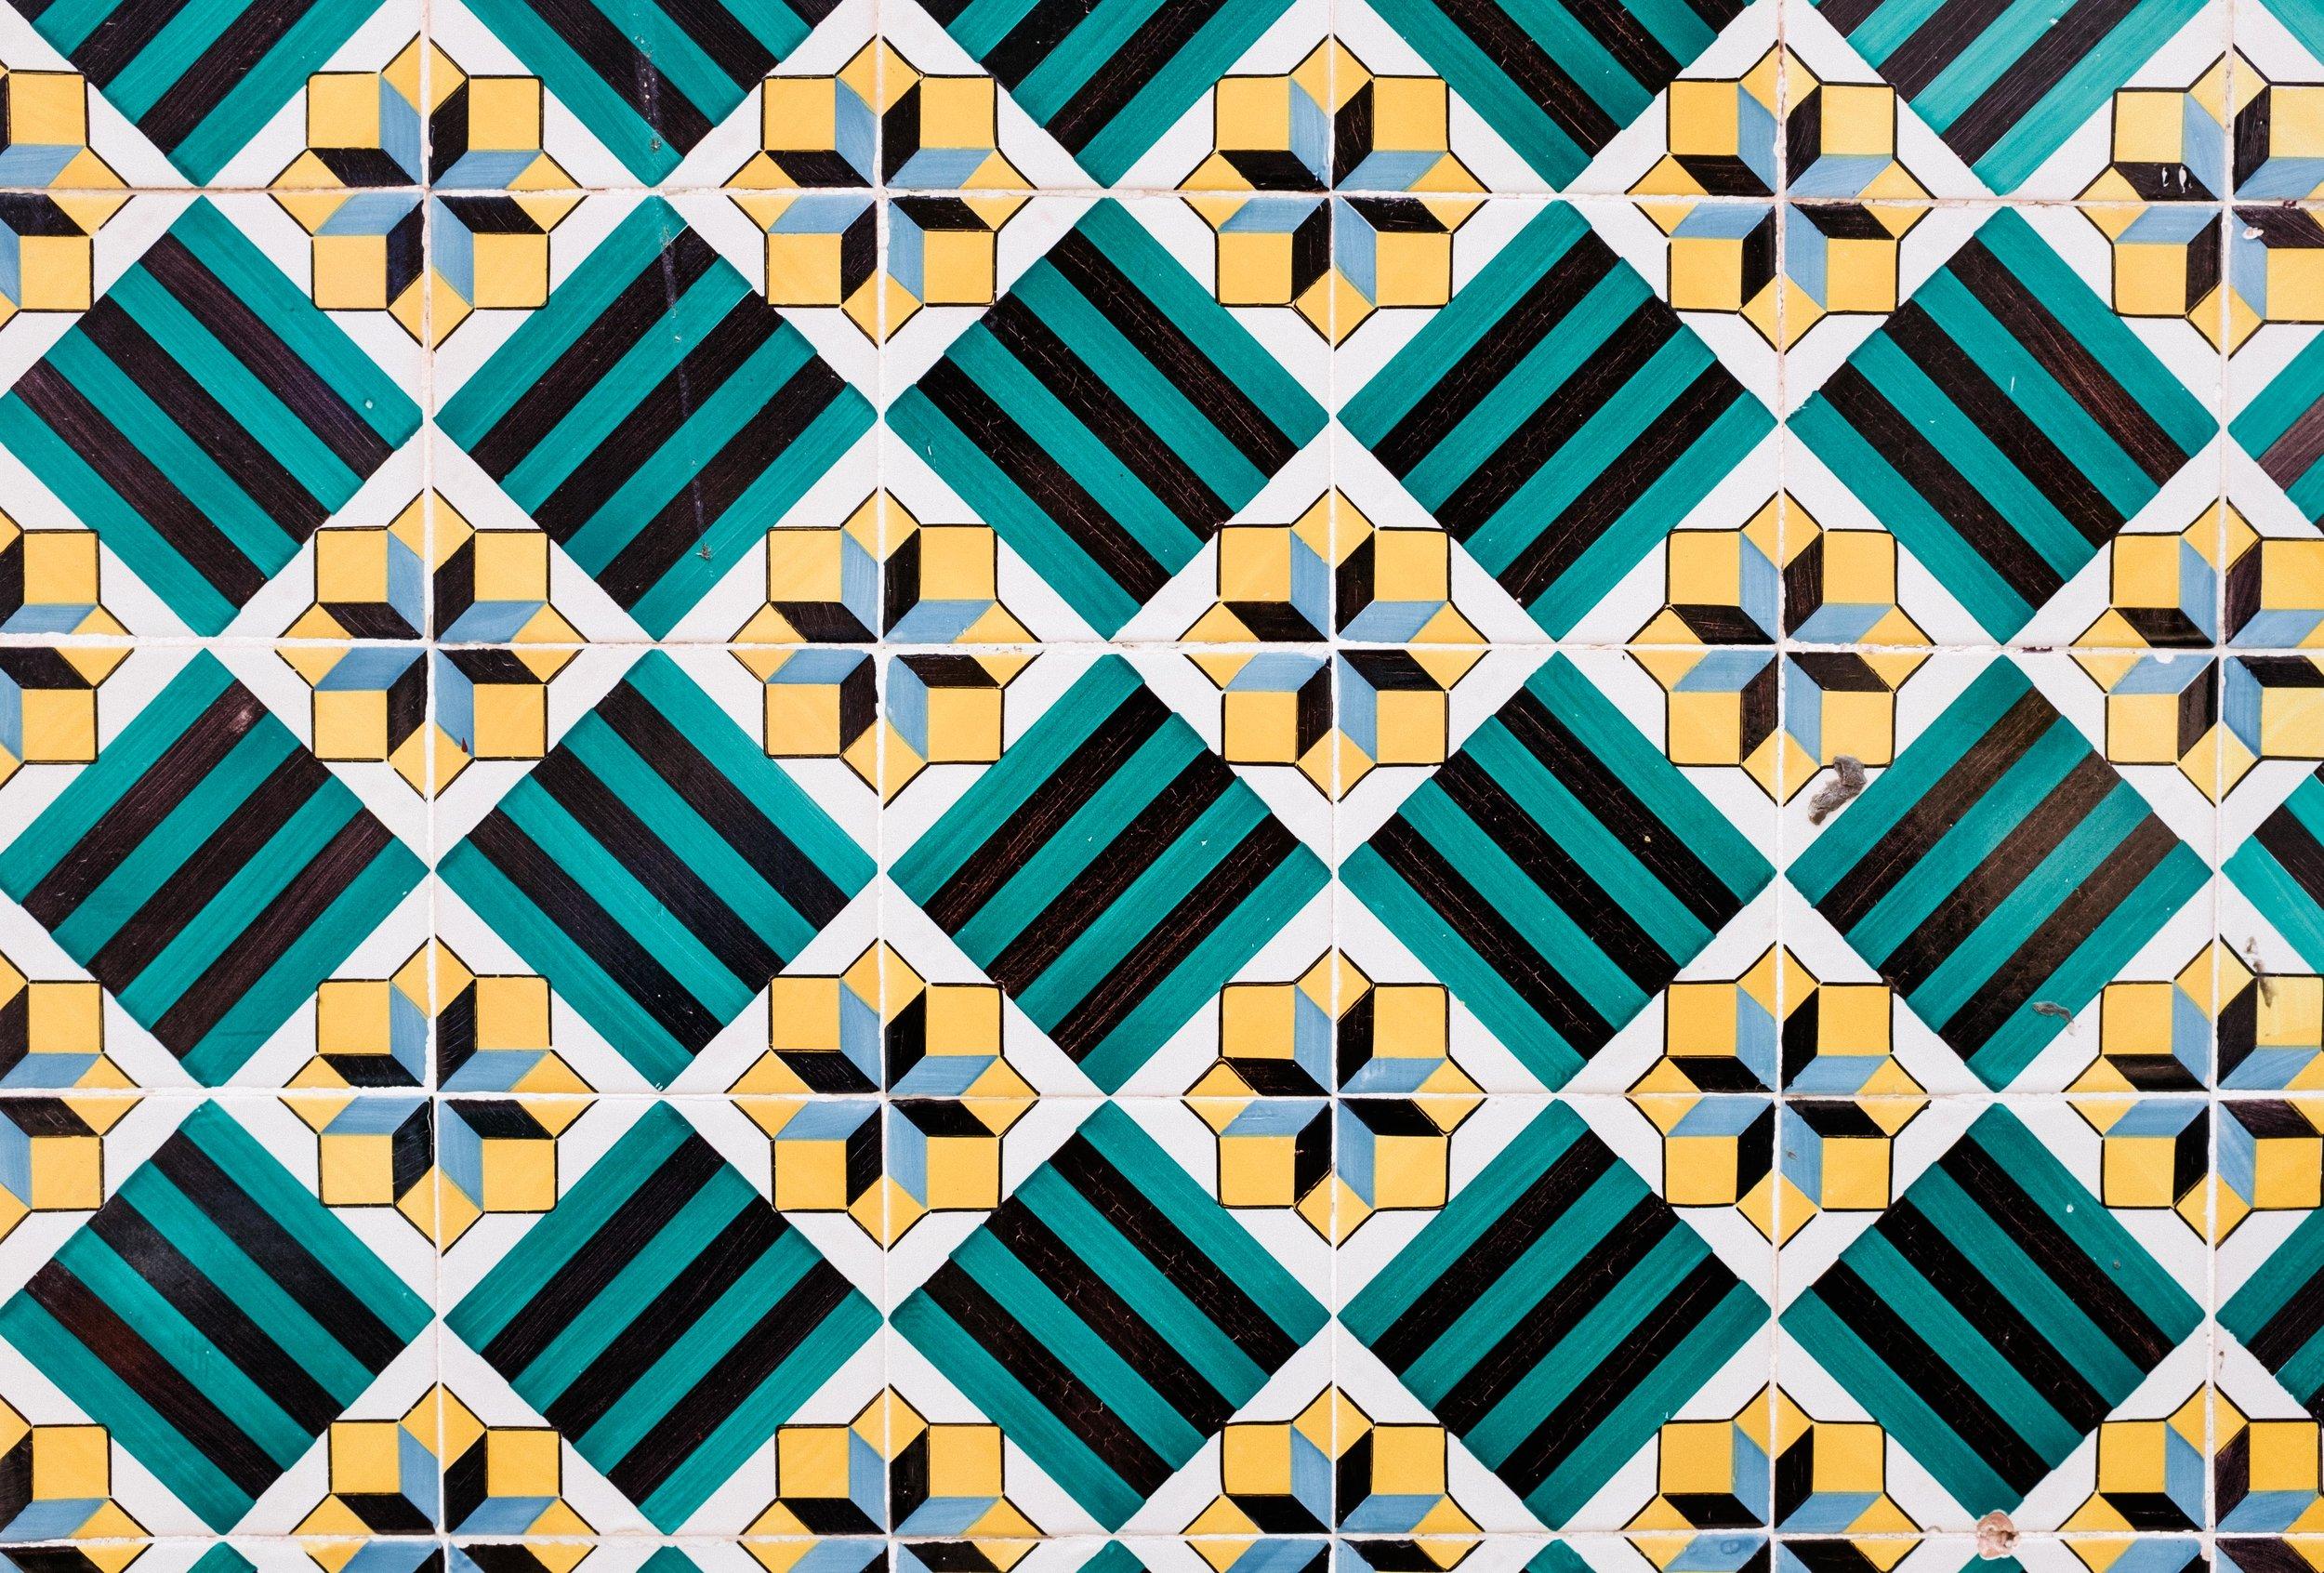 lisbon-portugal-azulejos-tiles-green-yellow-black